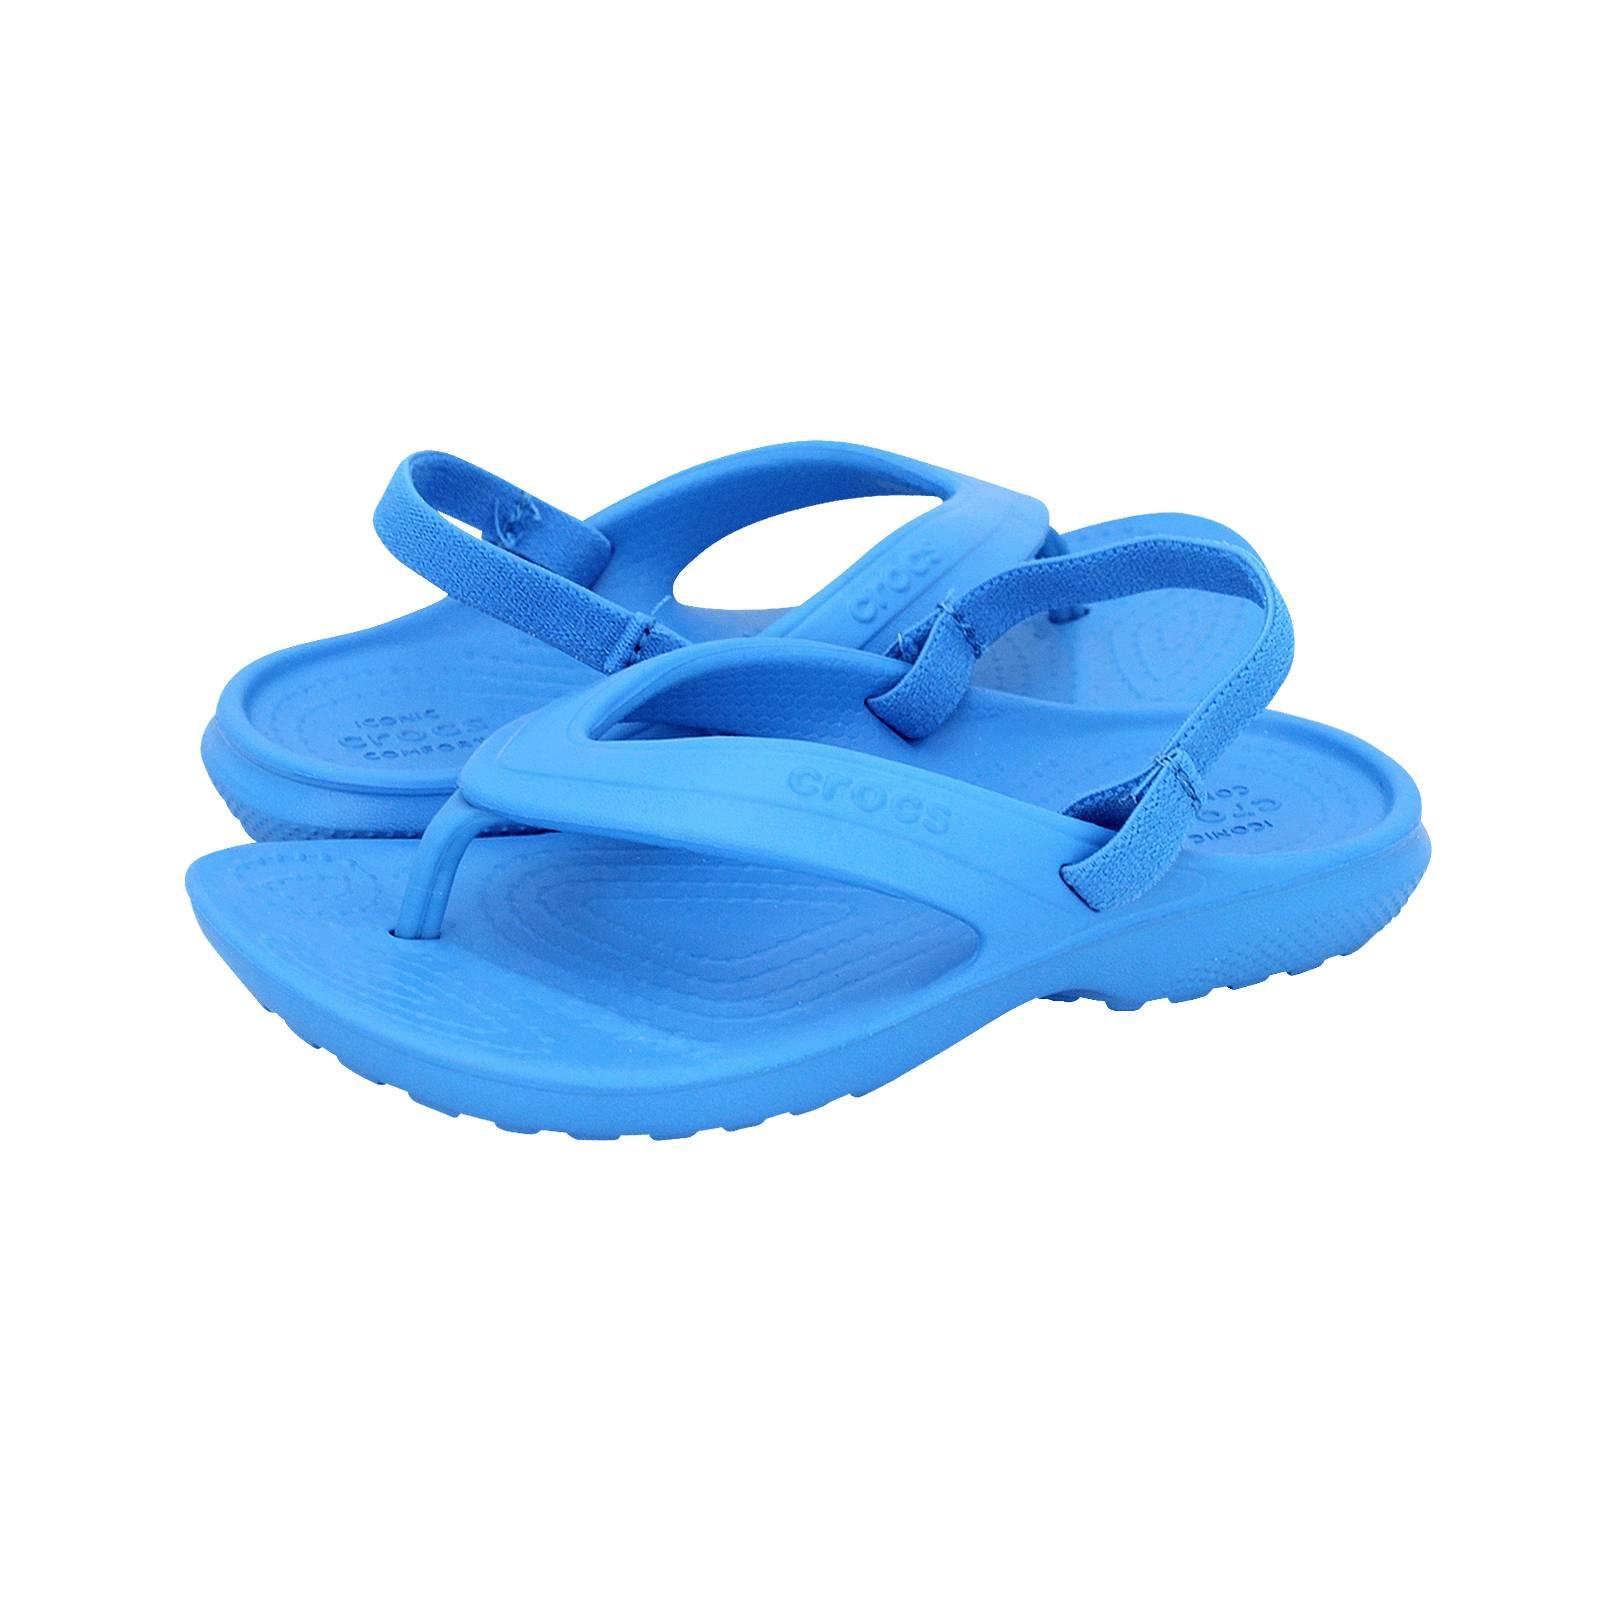 83b58d20e41 Classic Flip - Crocs Παιδικά Σανδάλια made of croslite - Gianna ...